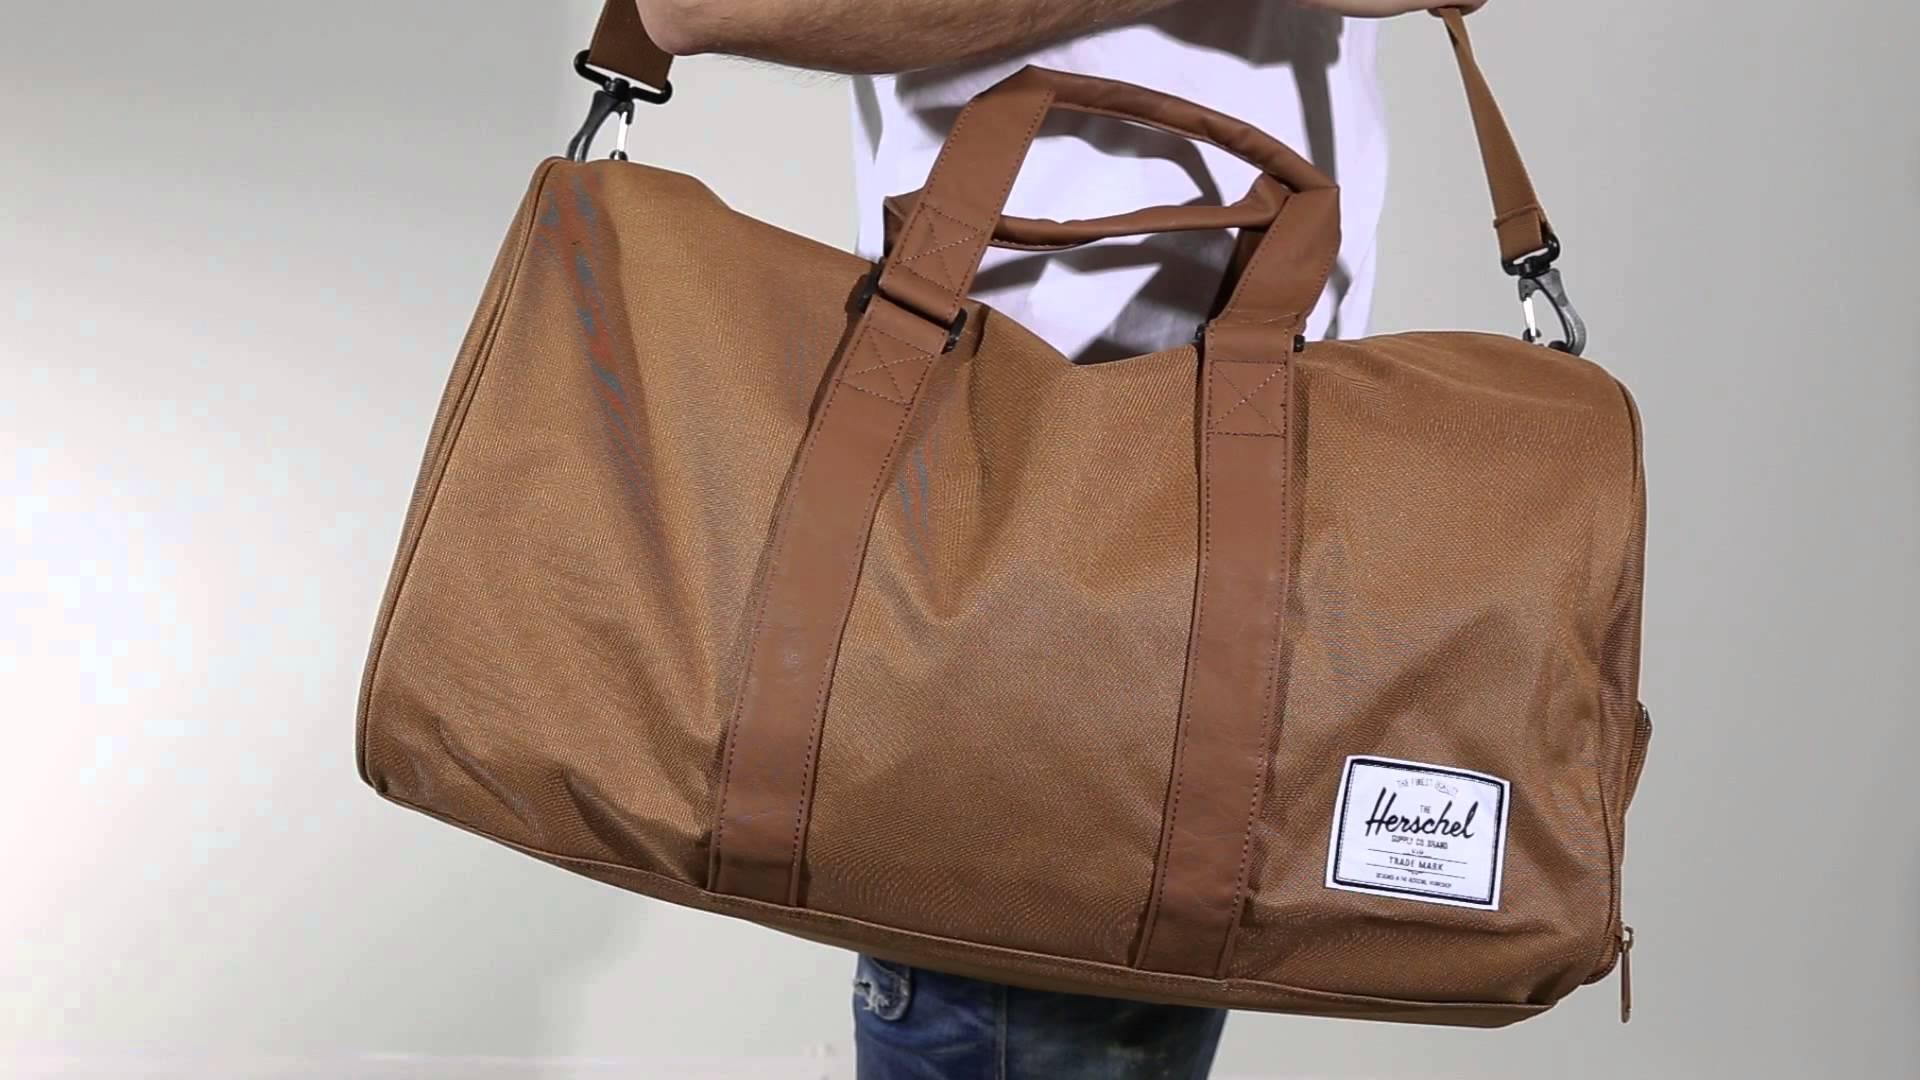 Herschel Novel Duffle – gym bag for men